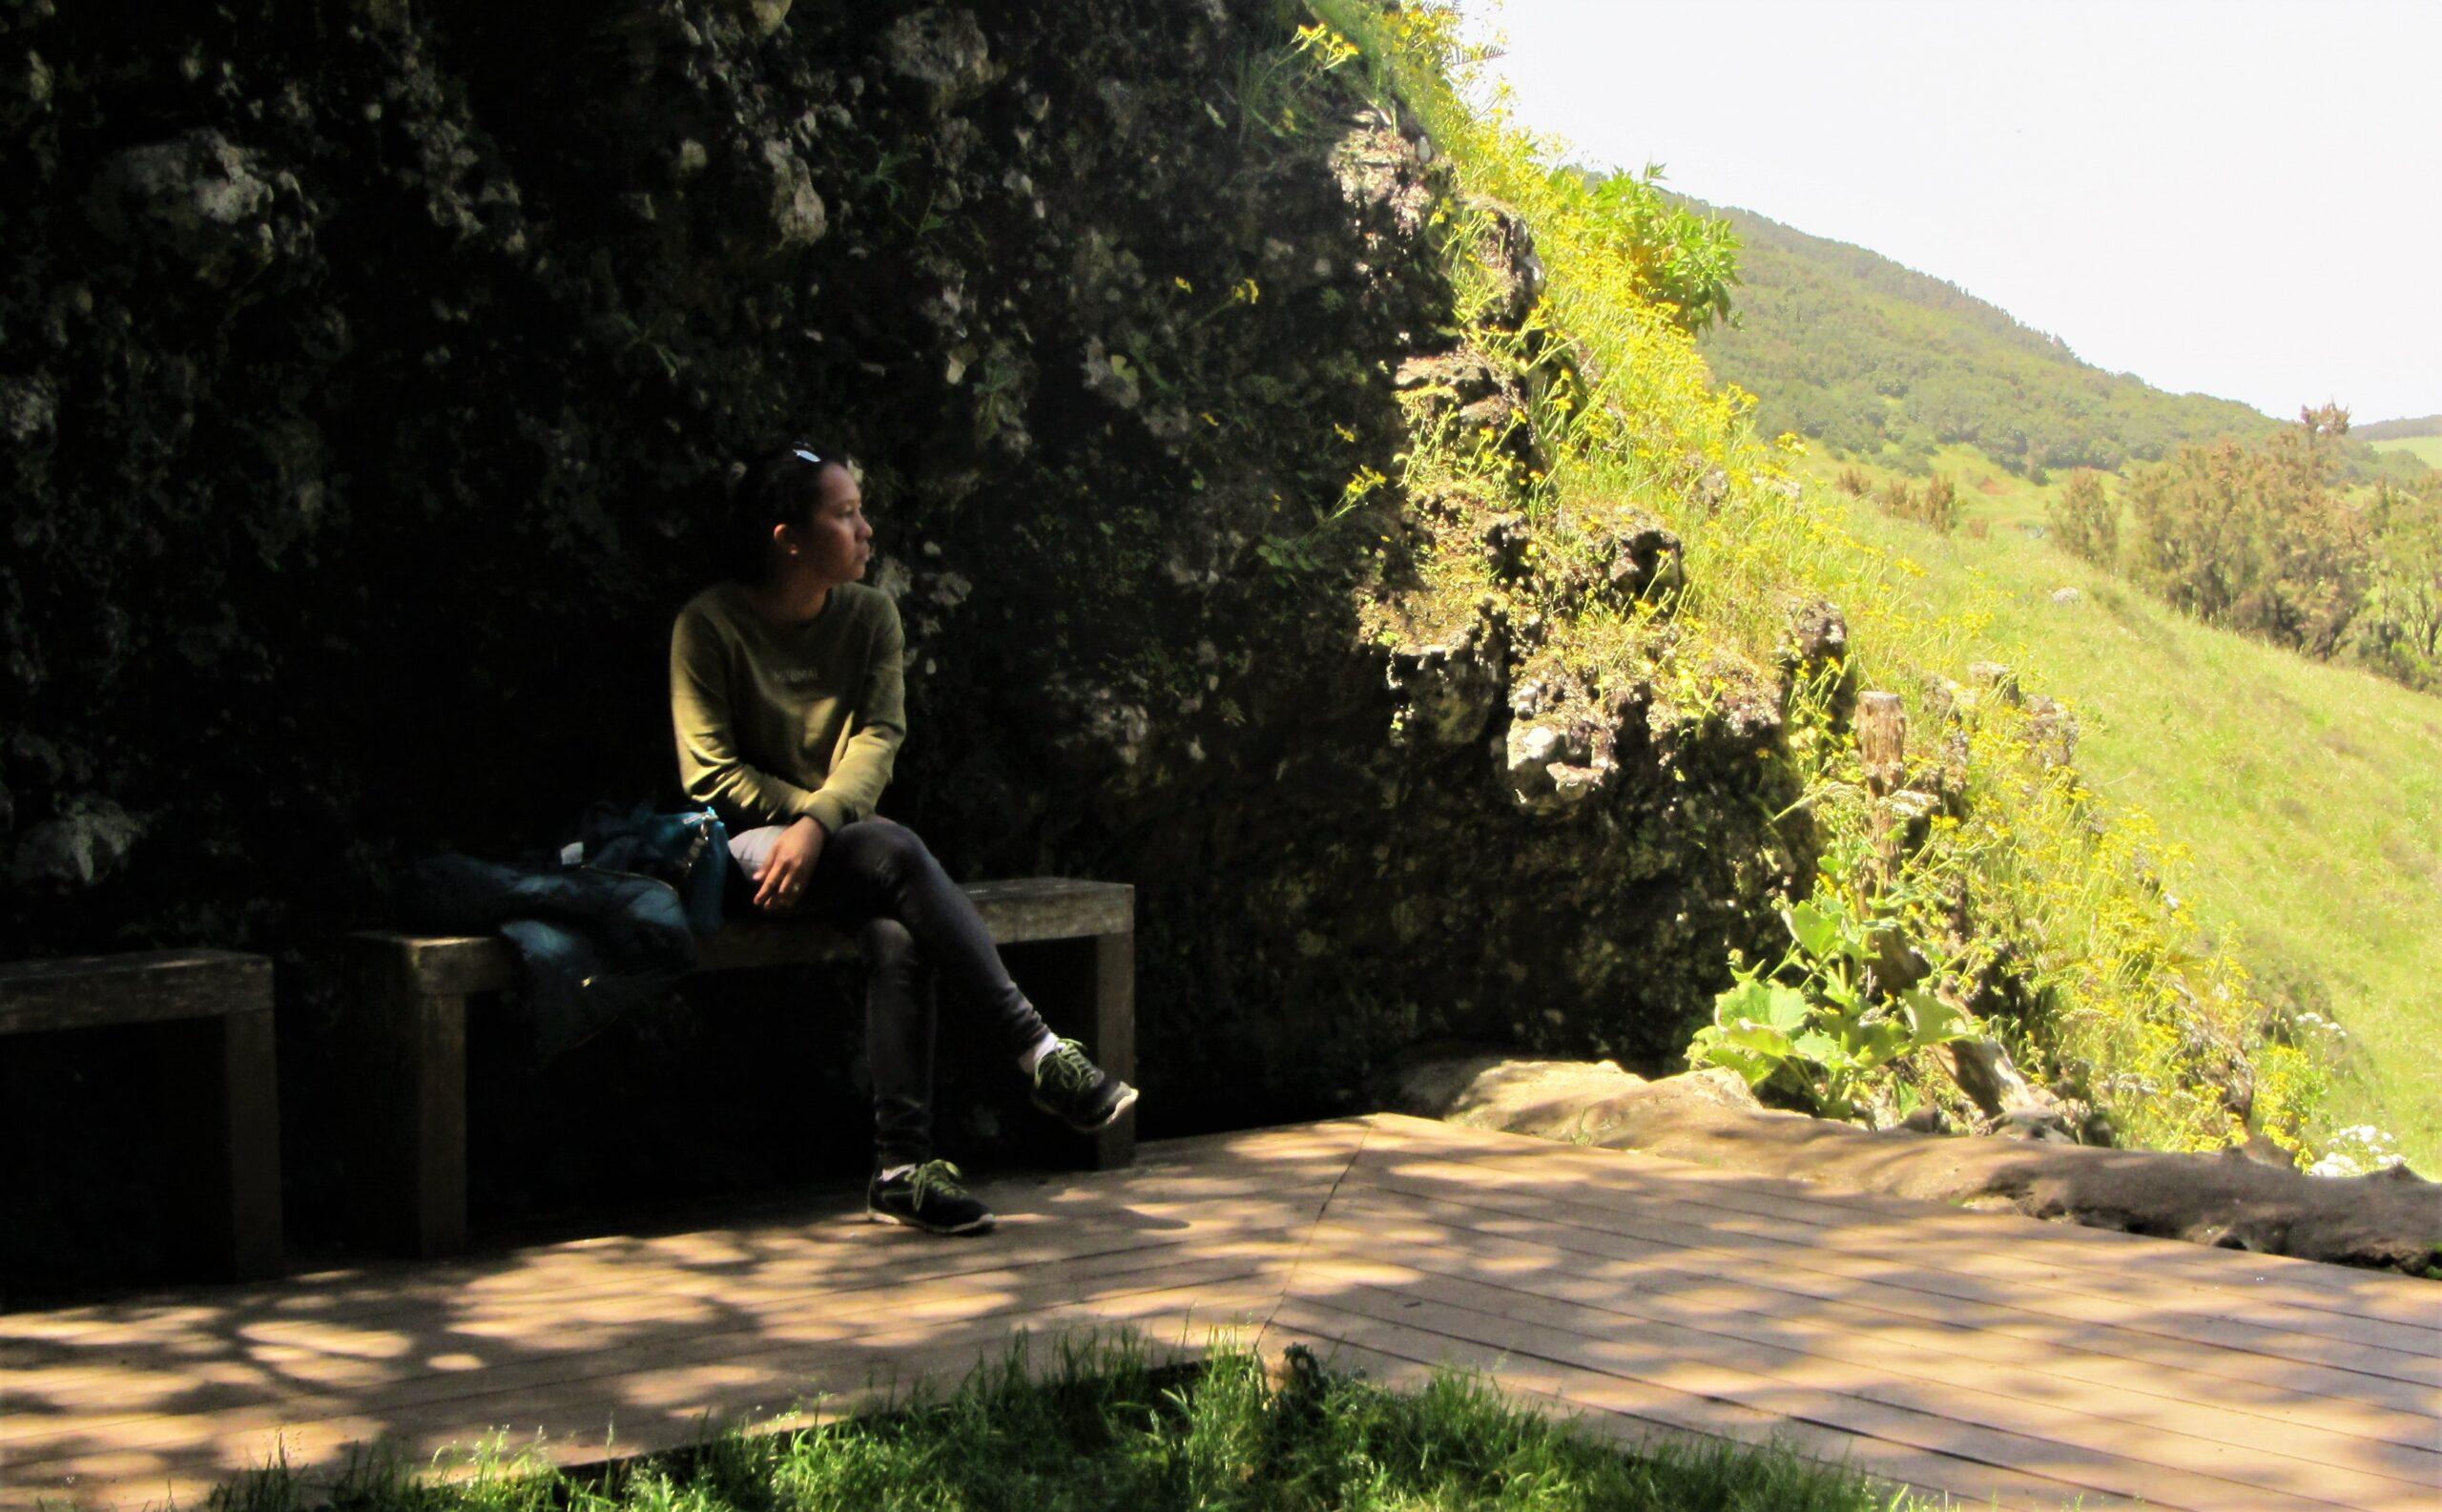 Meditation by the Arbol de Garoe